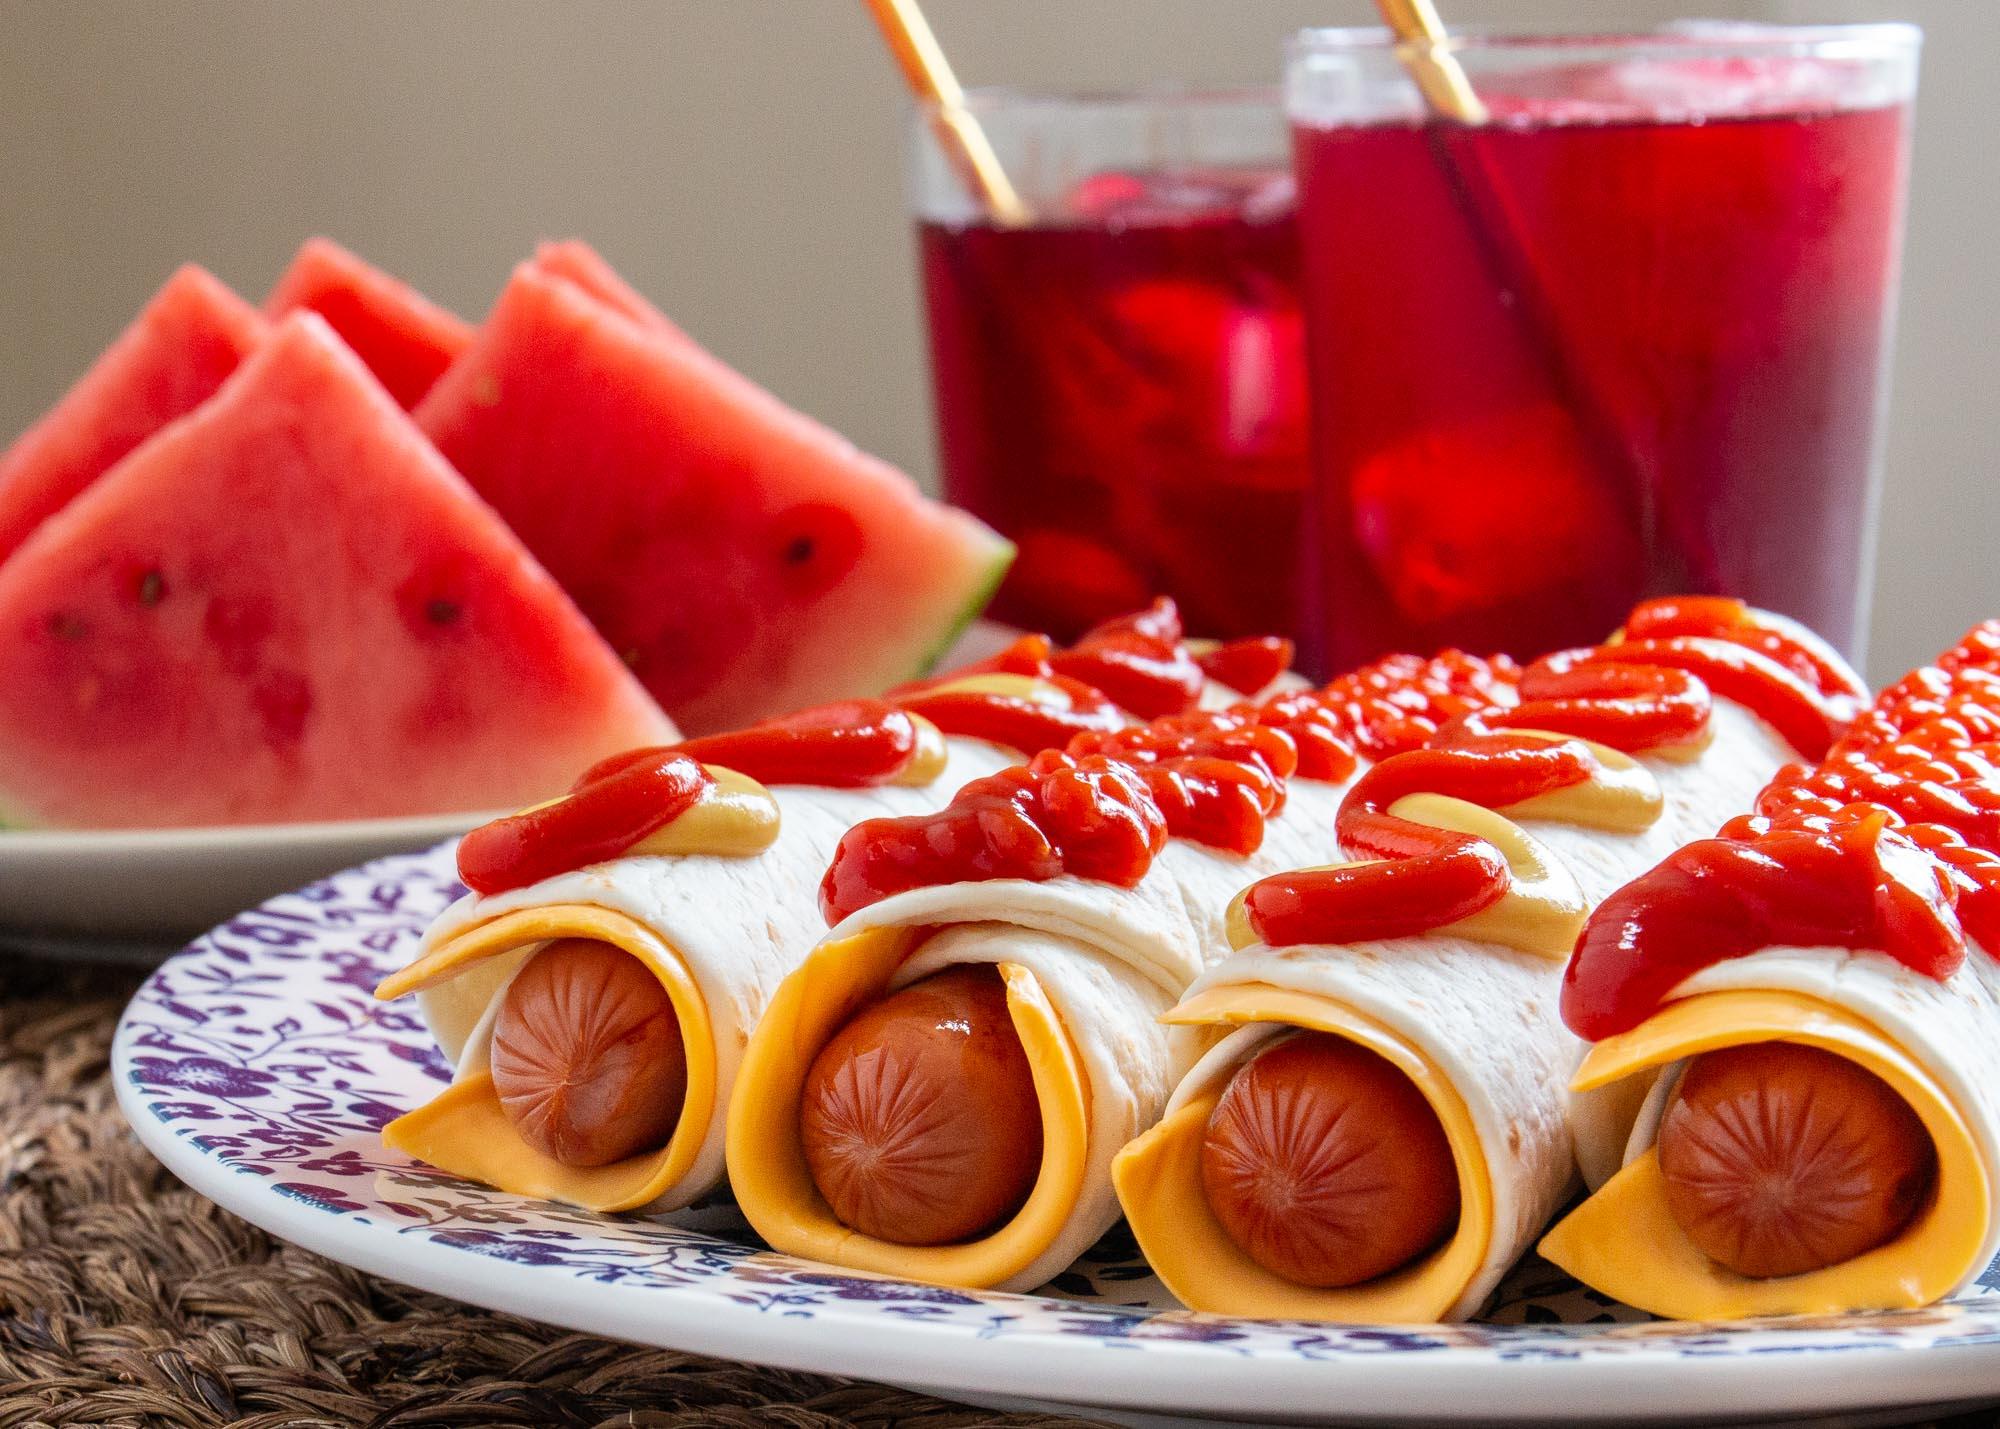 Burrito-Style Hot Dog Roll-Ups